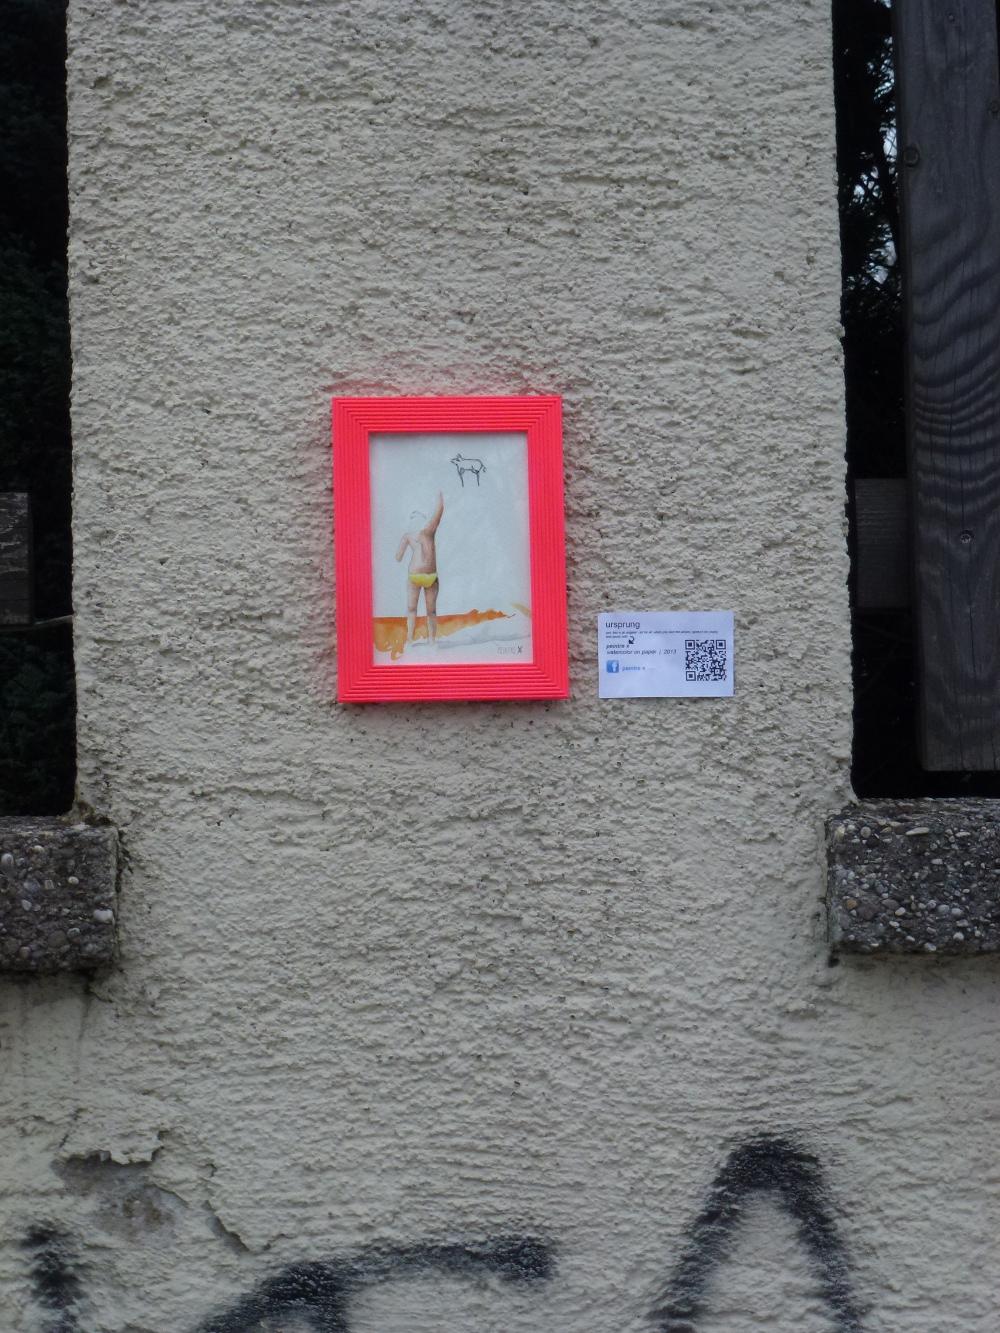 peintre x m nchner streetart k nstler urban art life style. Black Bedroom Furniture Sets. Home Design Ideas